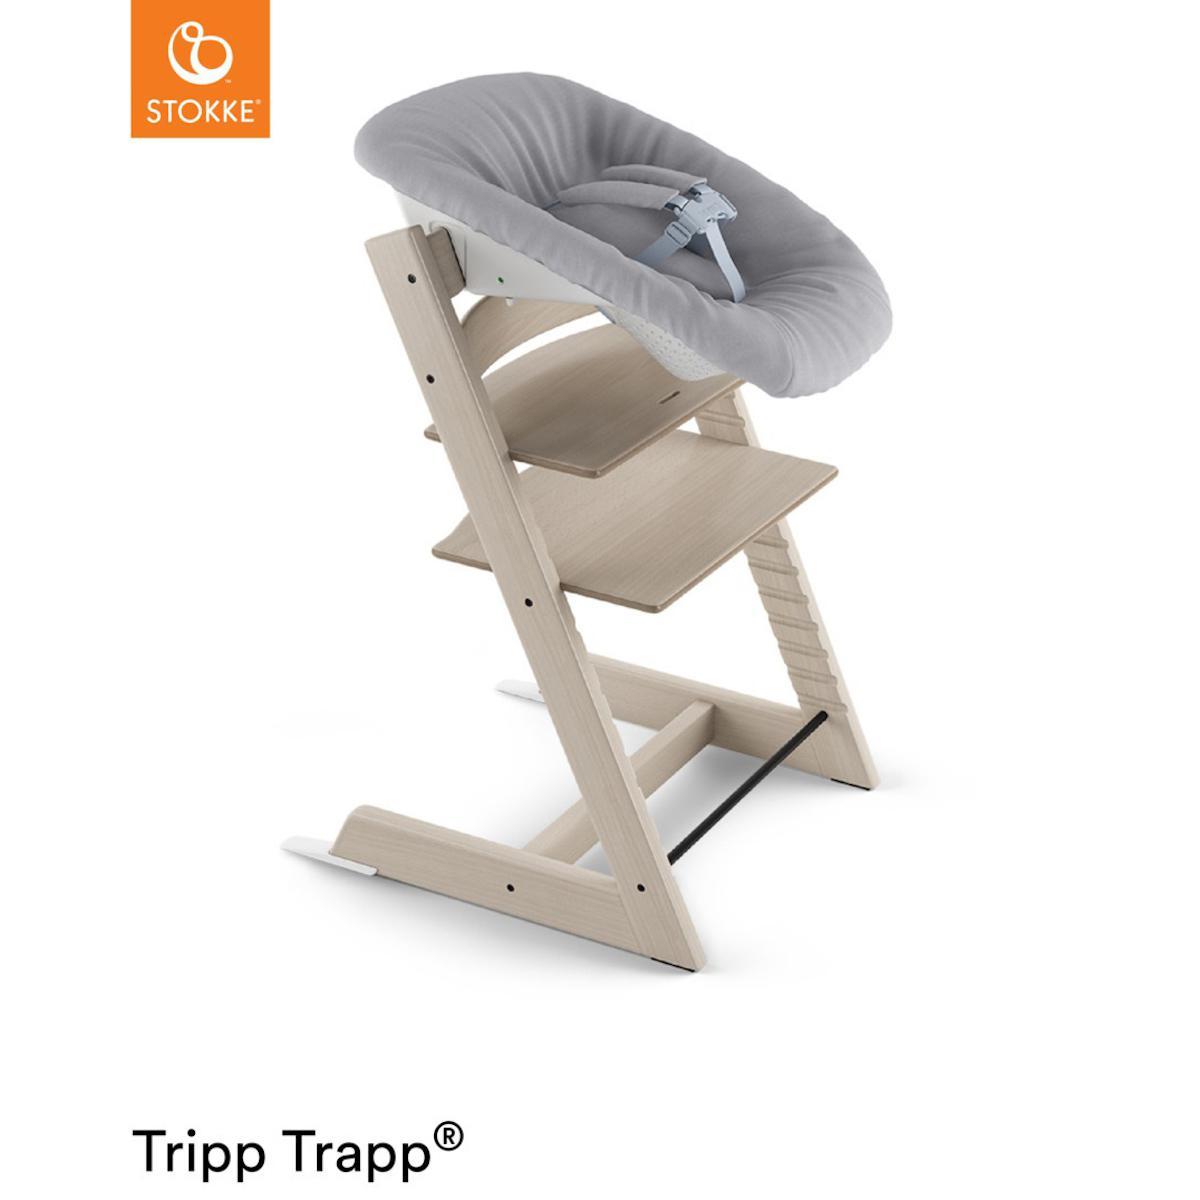 Trona bebé TRIPP TRAPP Stokke blanqueado